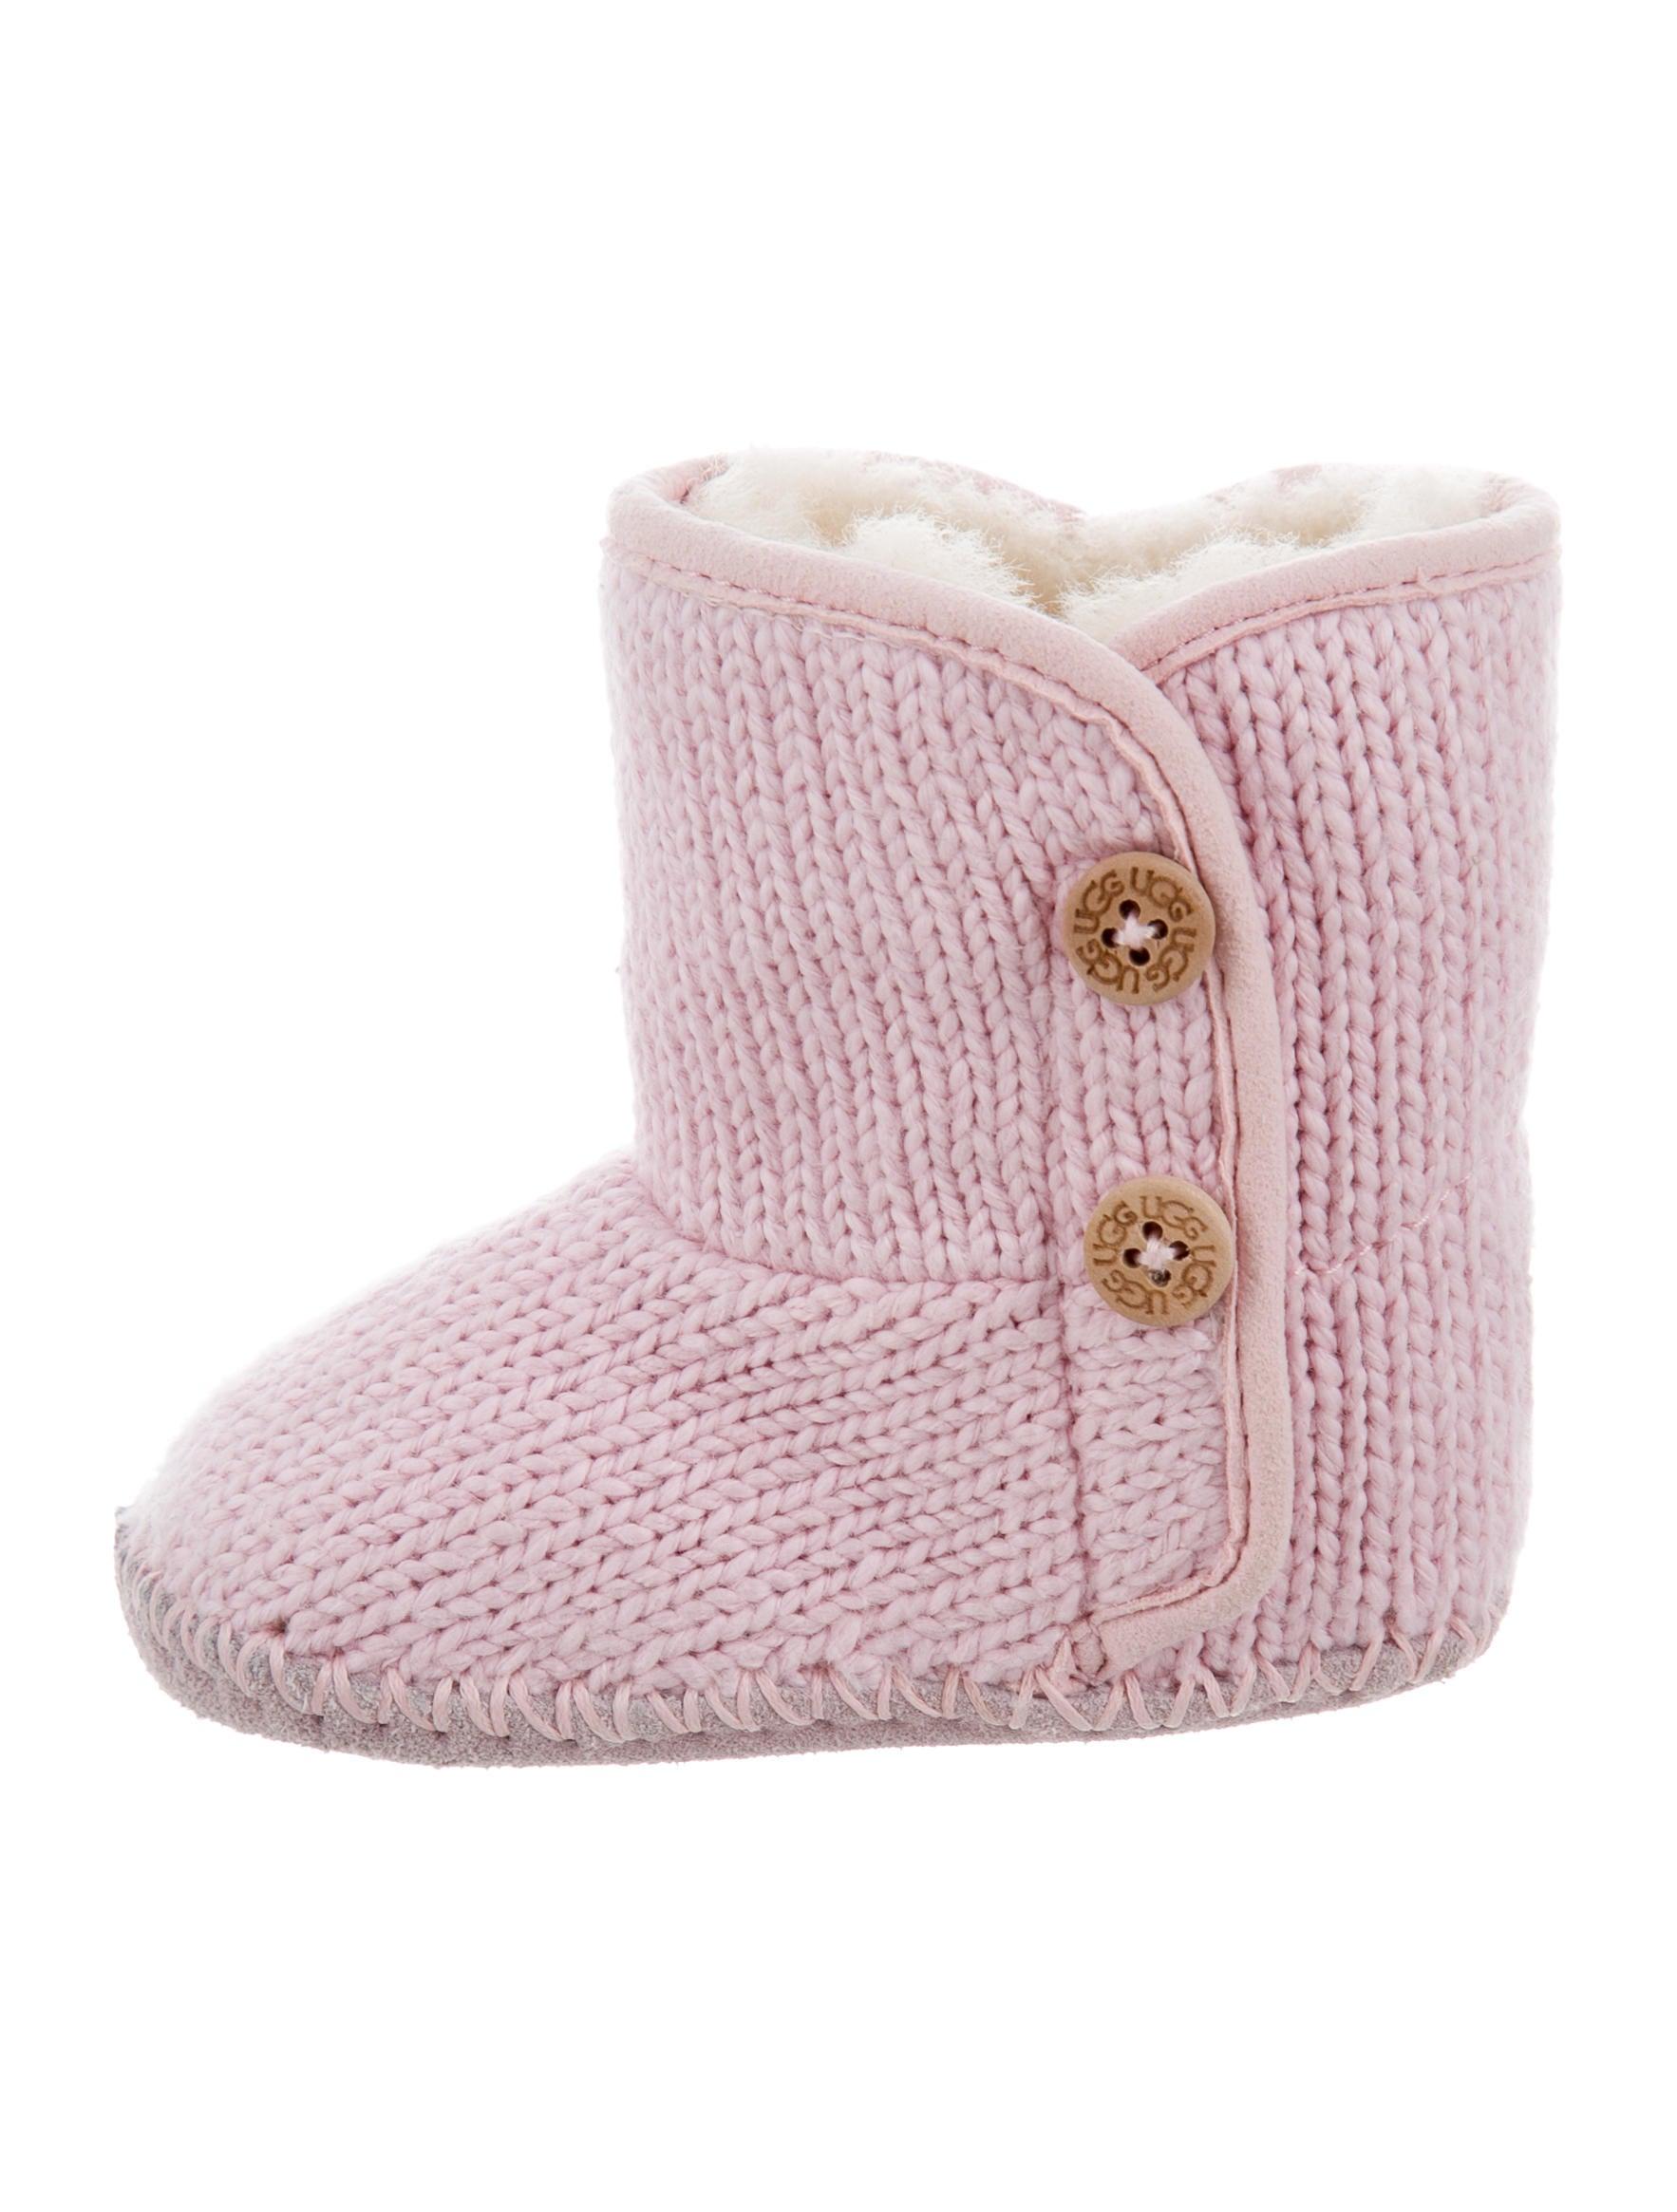 Knitting Websites Australia : Ugg australia girls purl knit booties